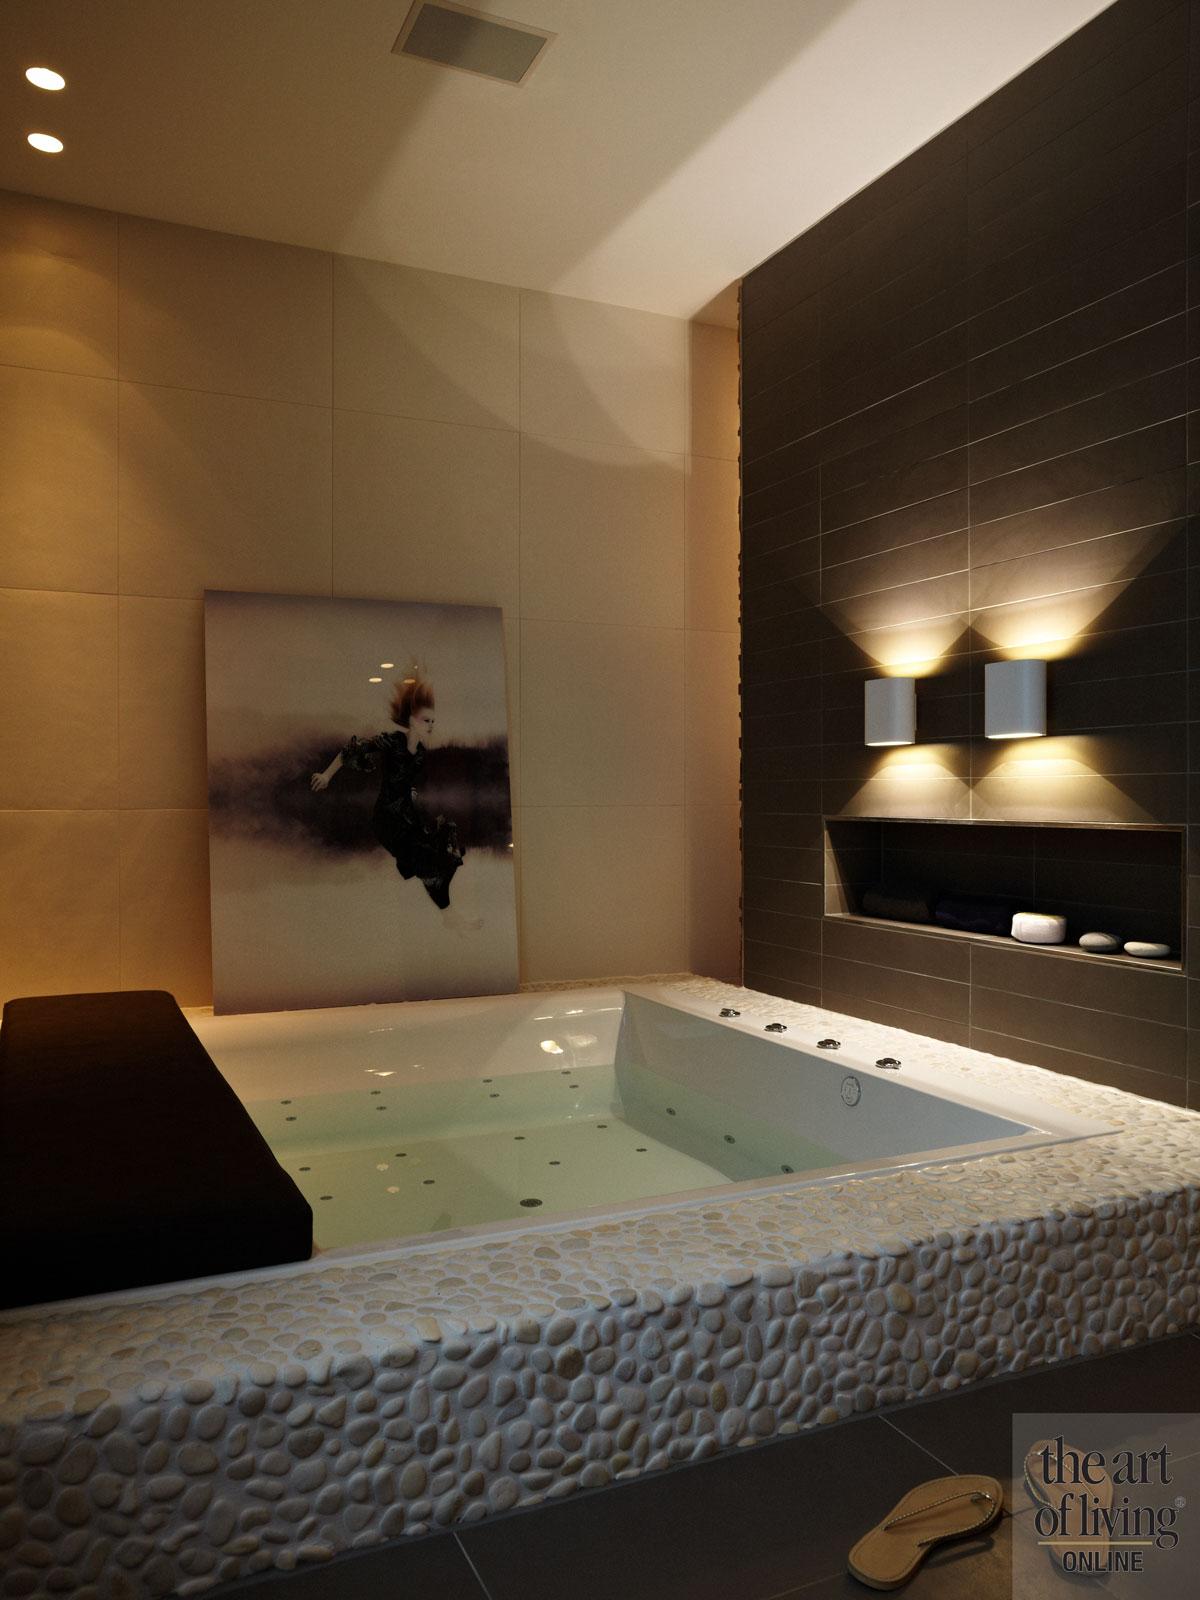 Jacuzzi, whirlpool, douche, design, Amsterdamse gracht, Osiris Hertman, the Art of Living